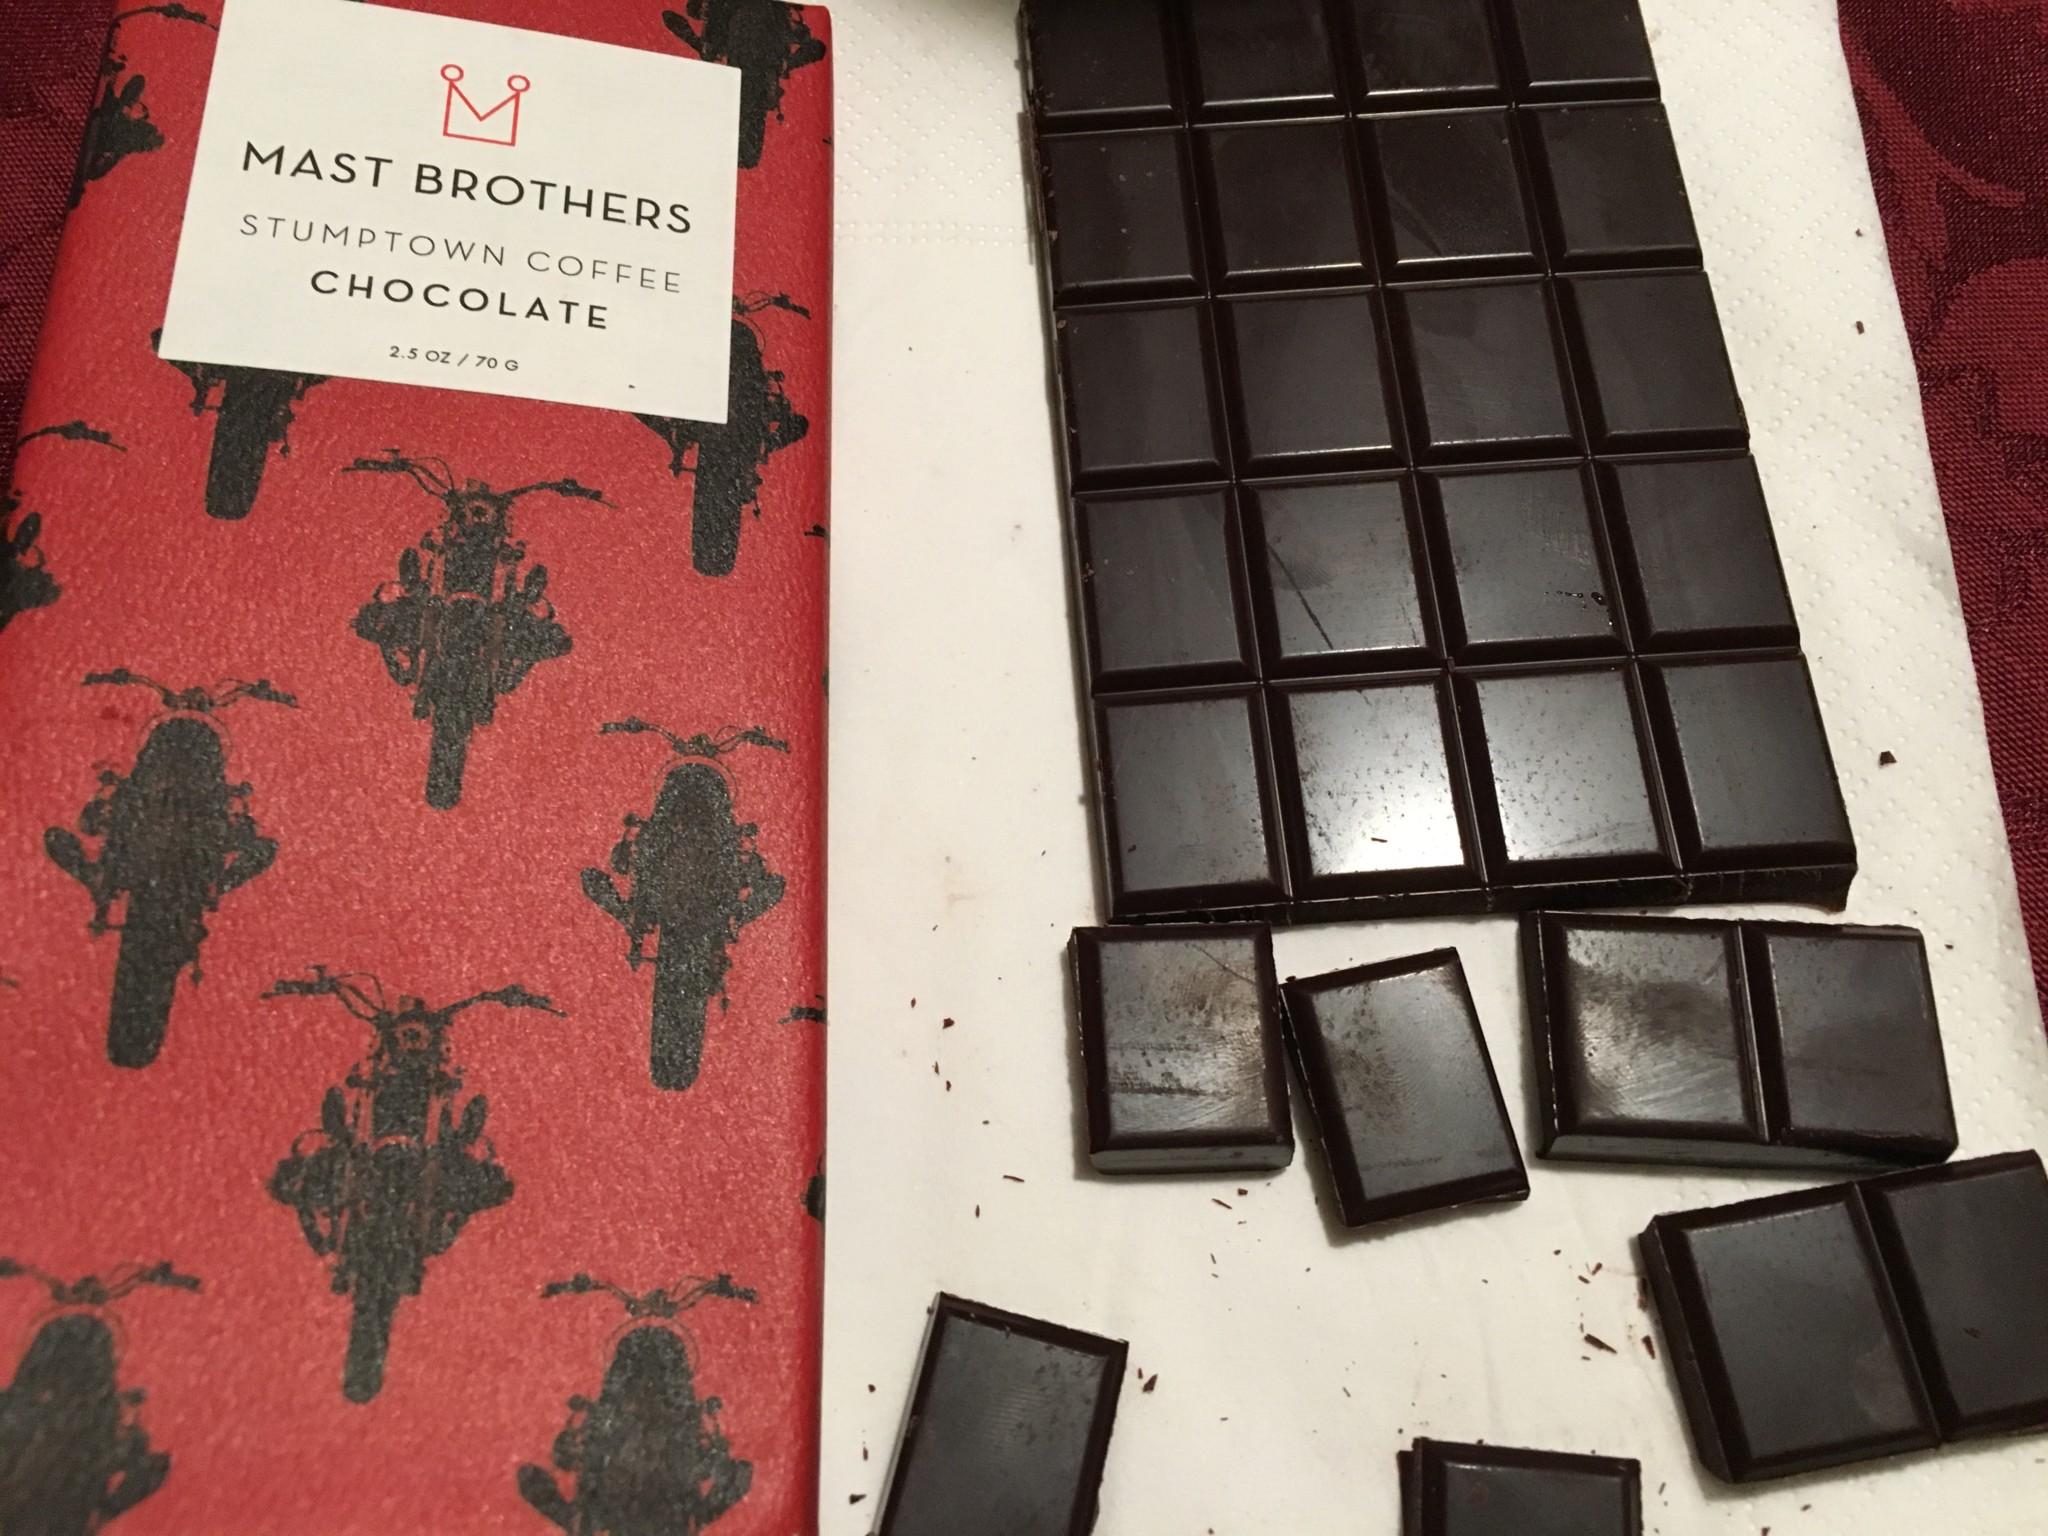 Mast Brothers Stumptown Coffee Chocolate | Selective Elective